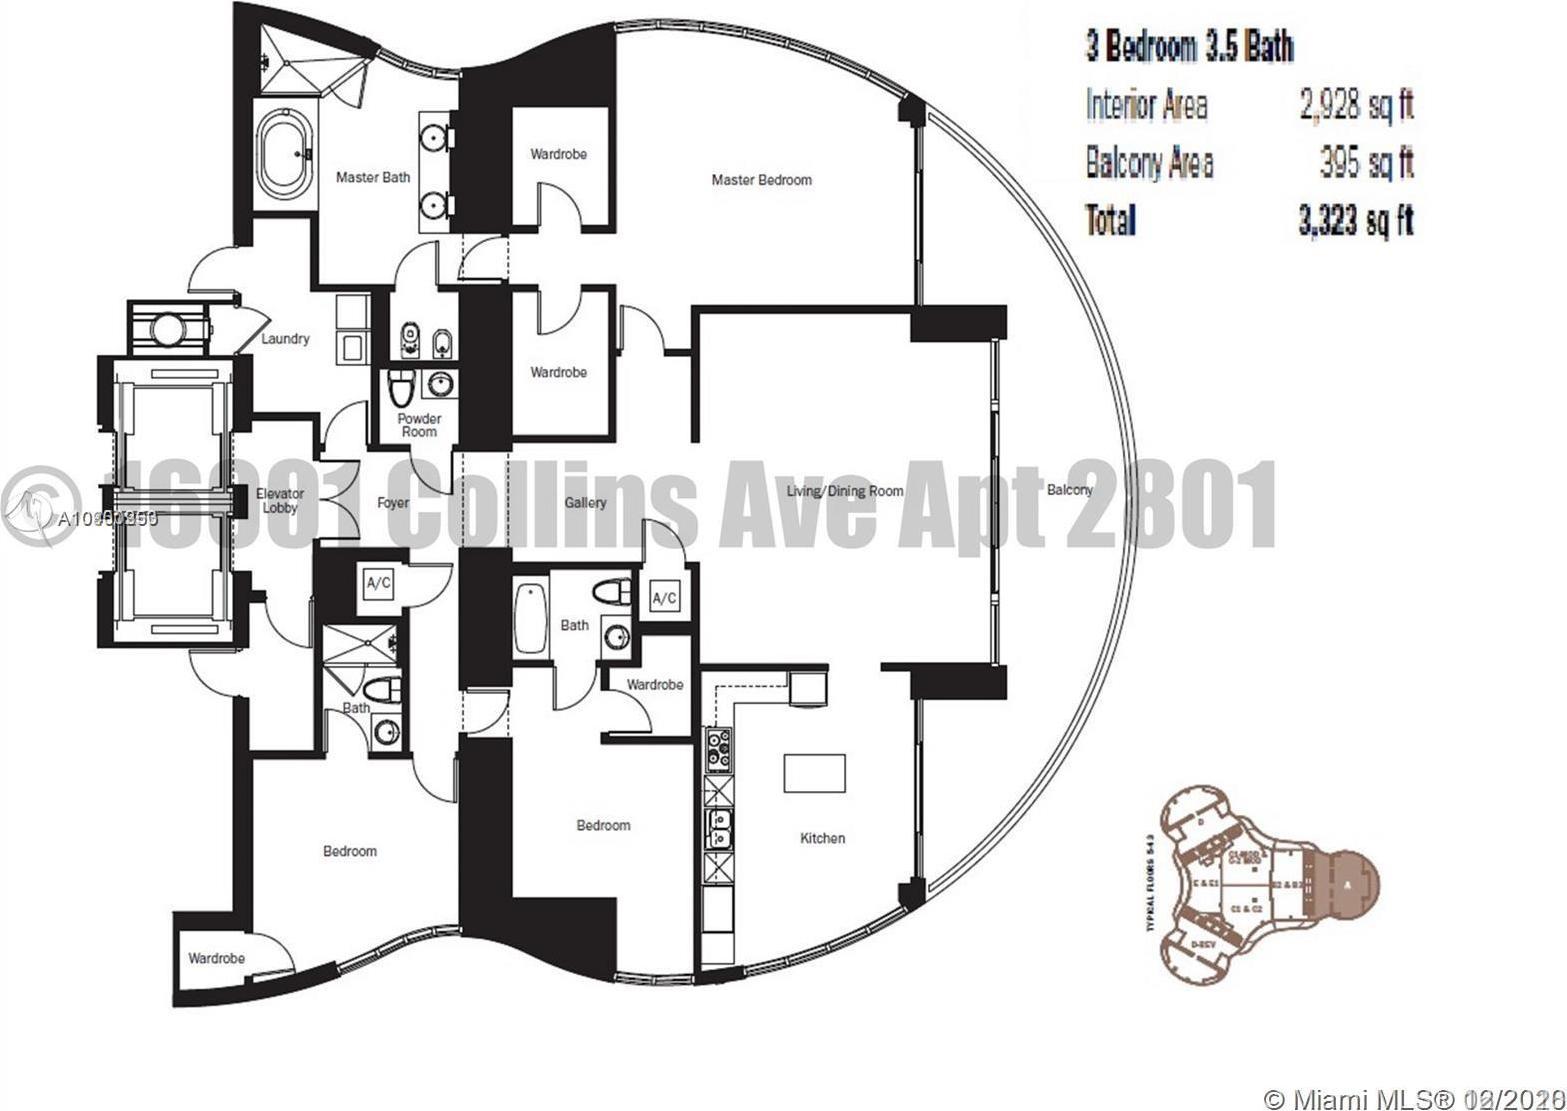 16001 COLLINS AVE Unit: 2801 preview